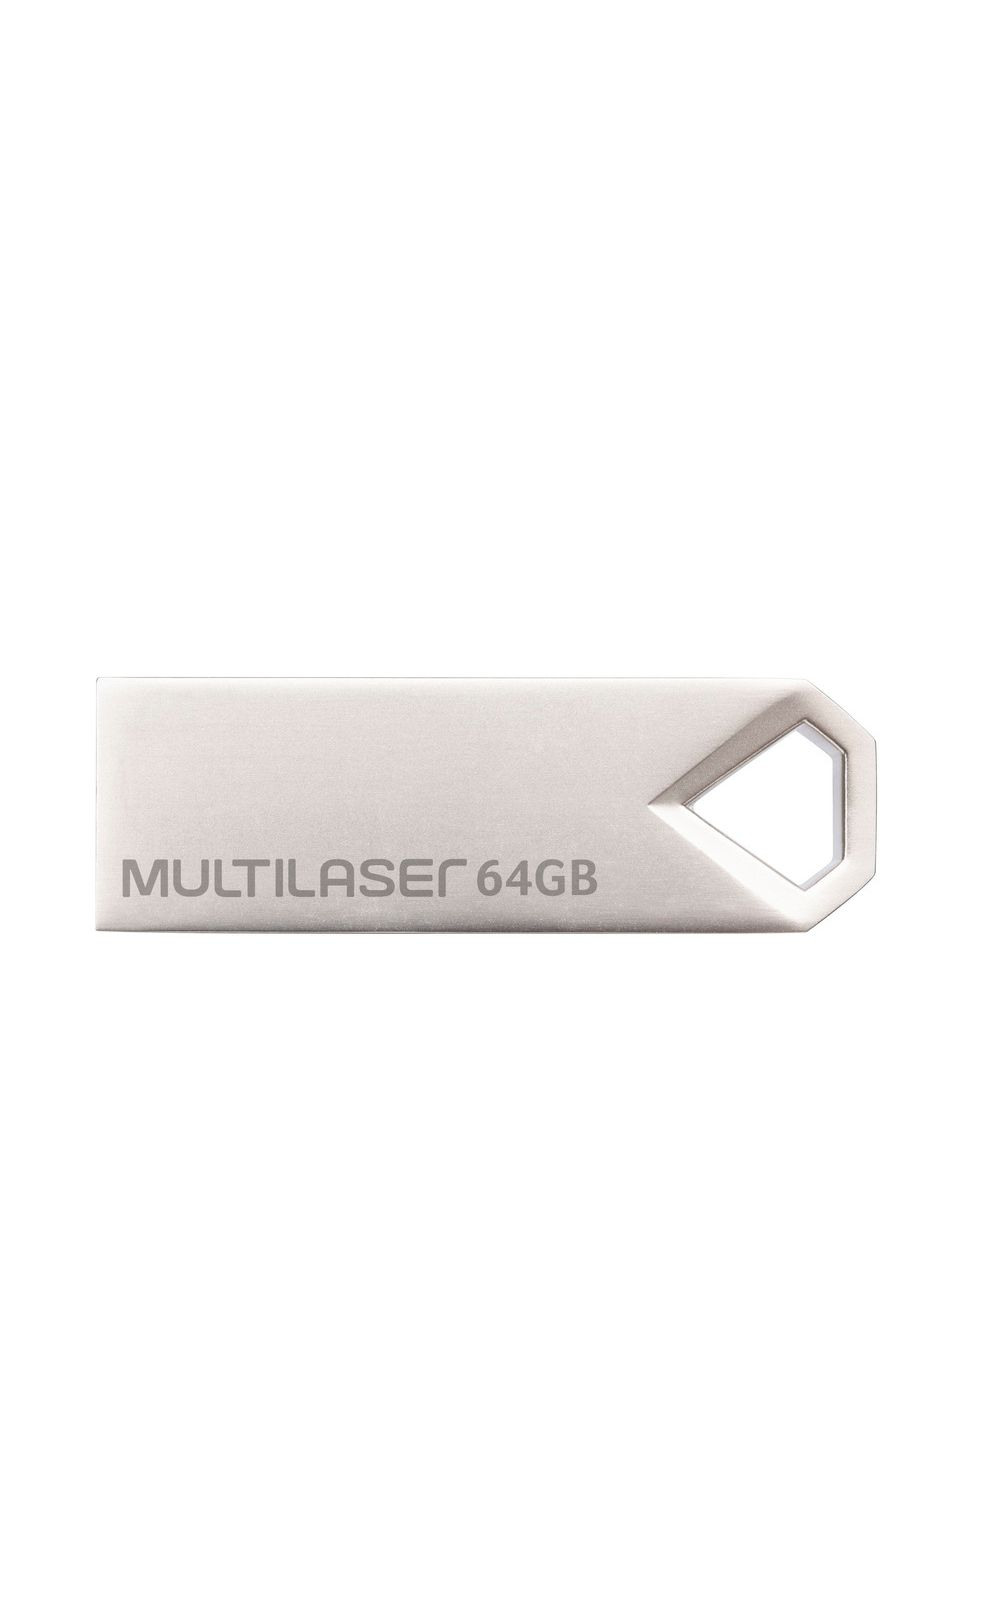 Foto 3 - Pendrive Multilaser Diamond 64GB USB 2.0 Metálico - PD852